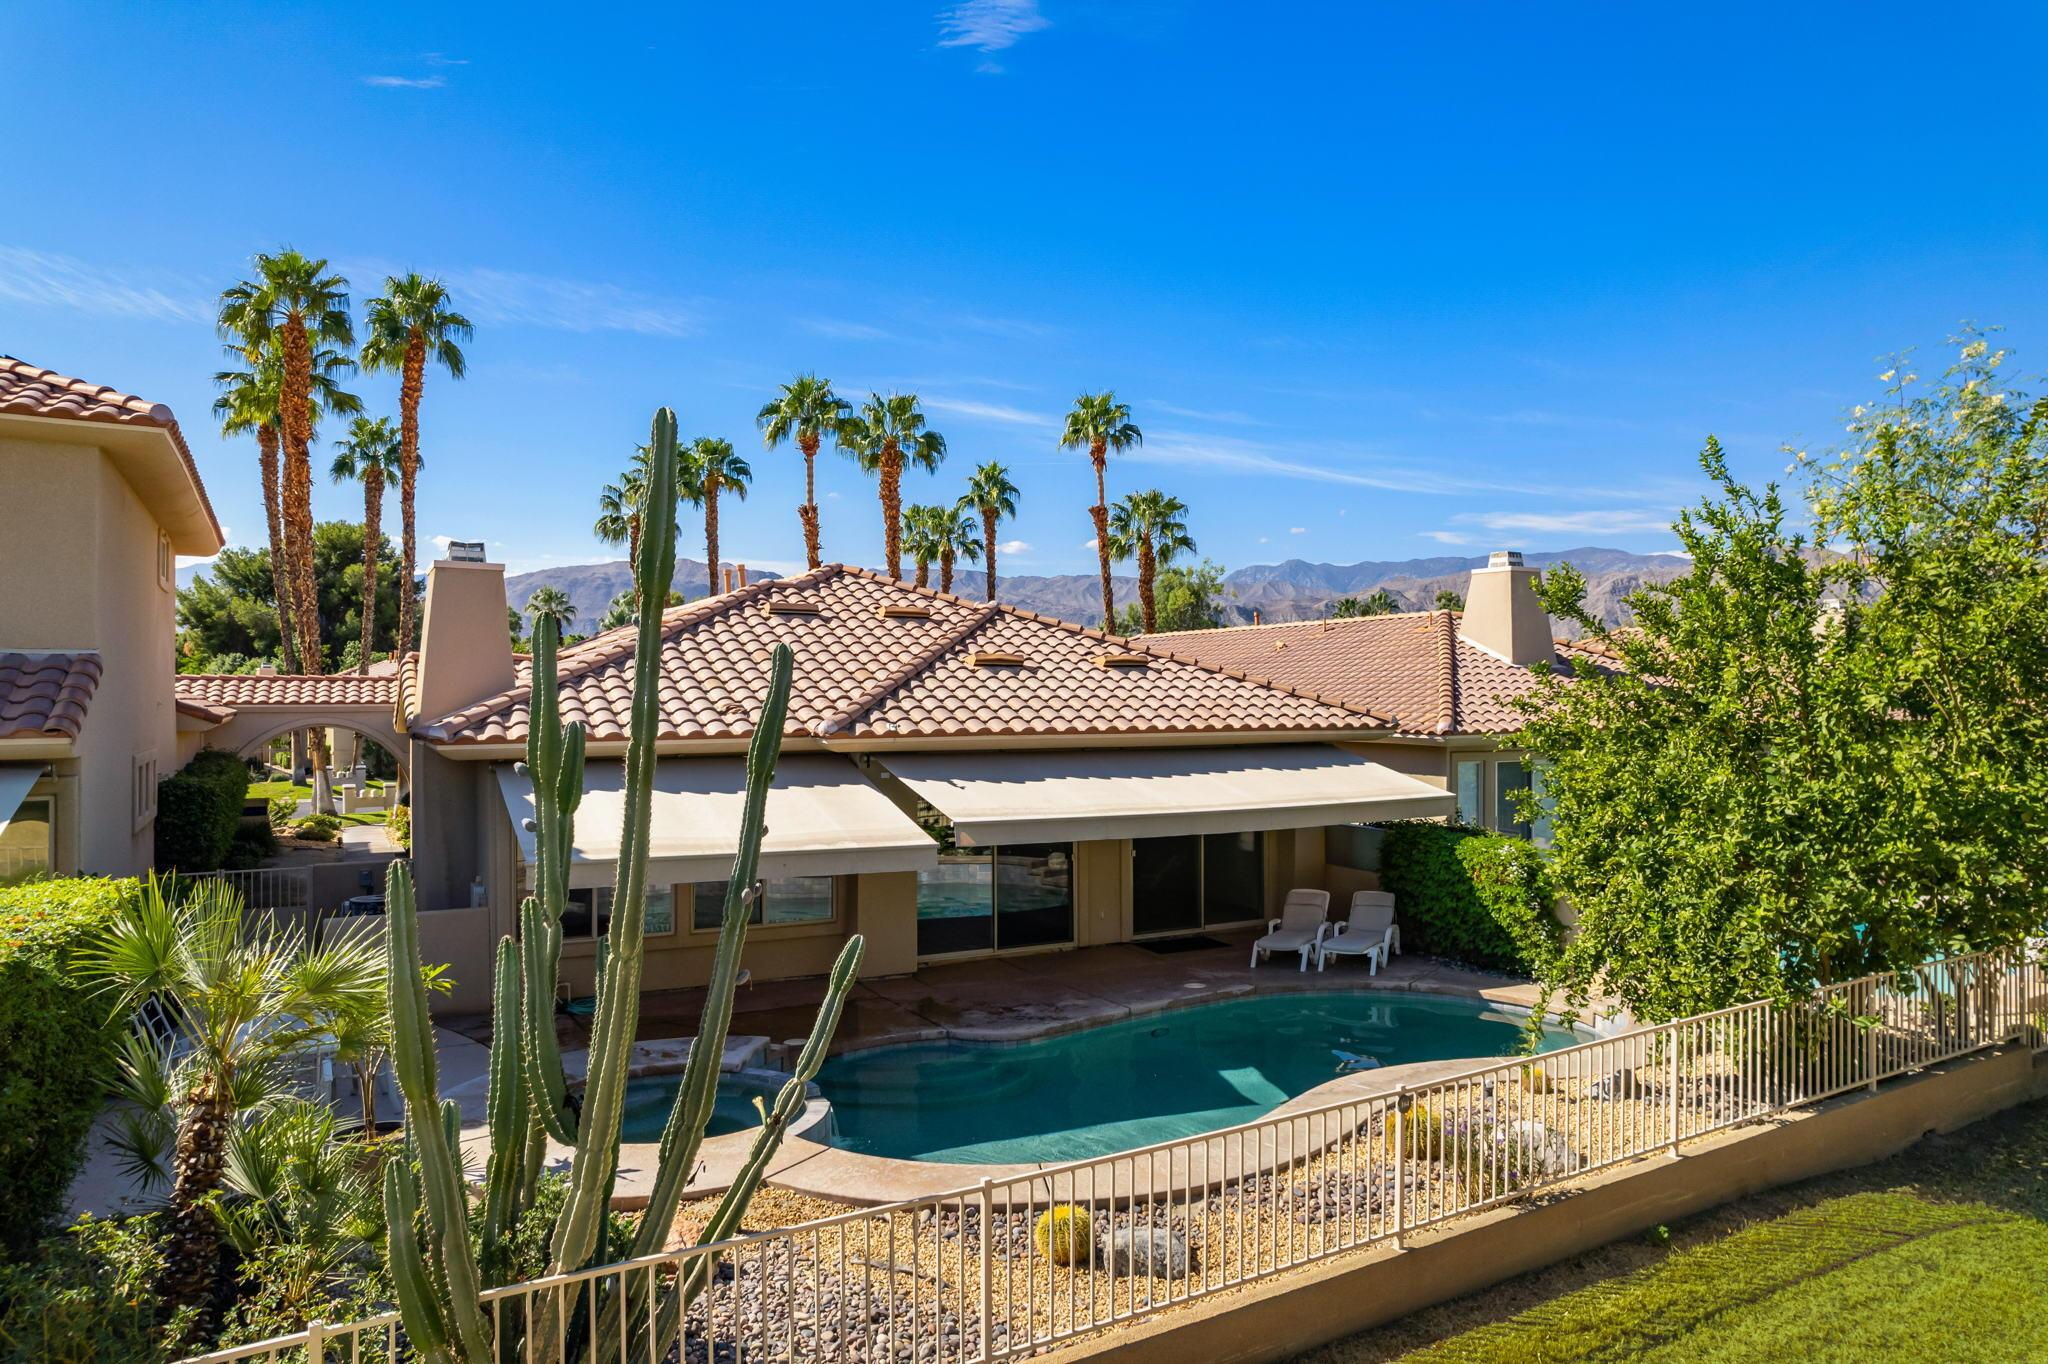 164 N Kavenish Drive, Rancho Mirage, CA 92270